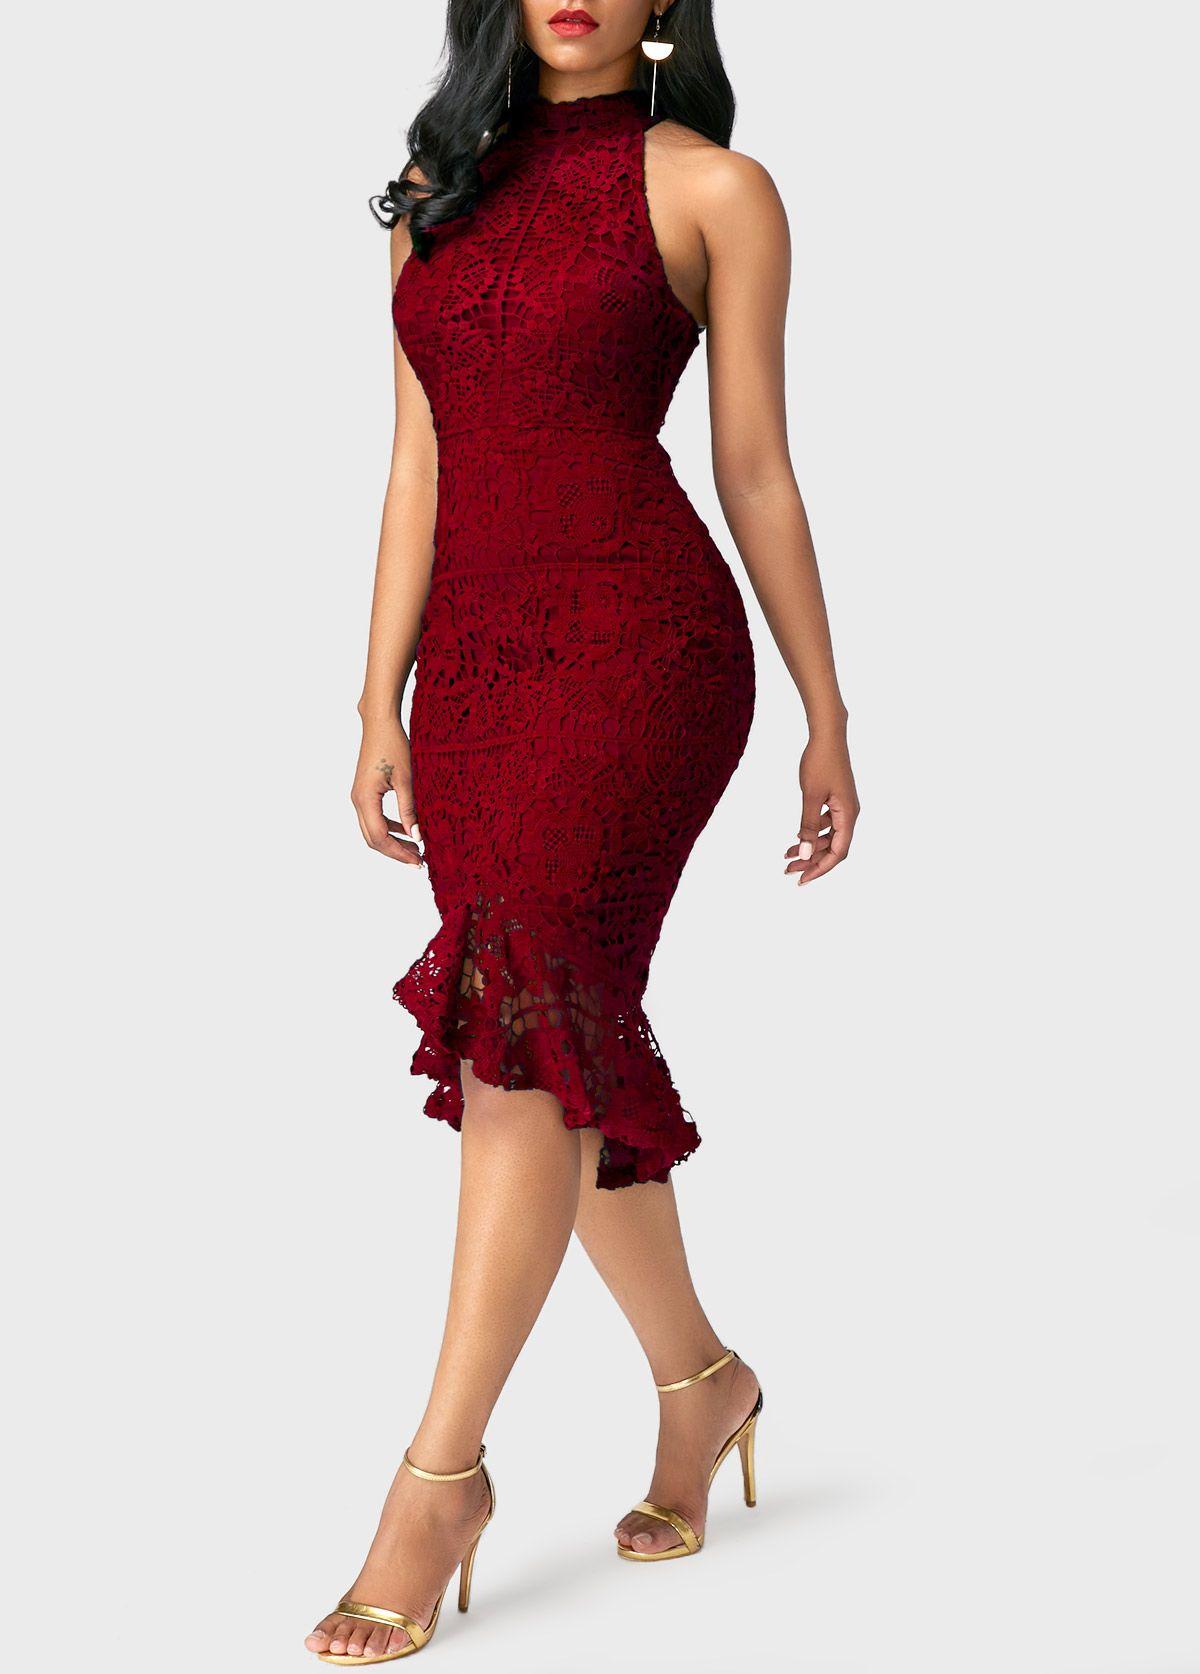 dcd085ad6d9 Burgundy Mock Neck Sleeveless Peplum Hem Sheath Dress